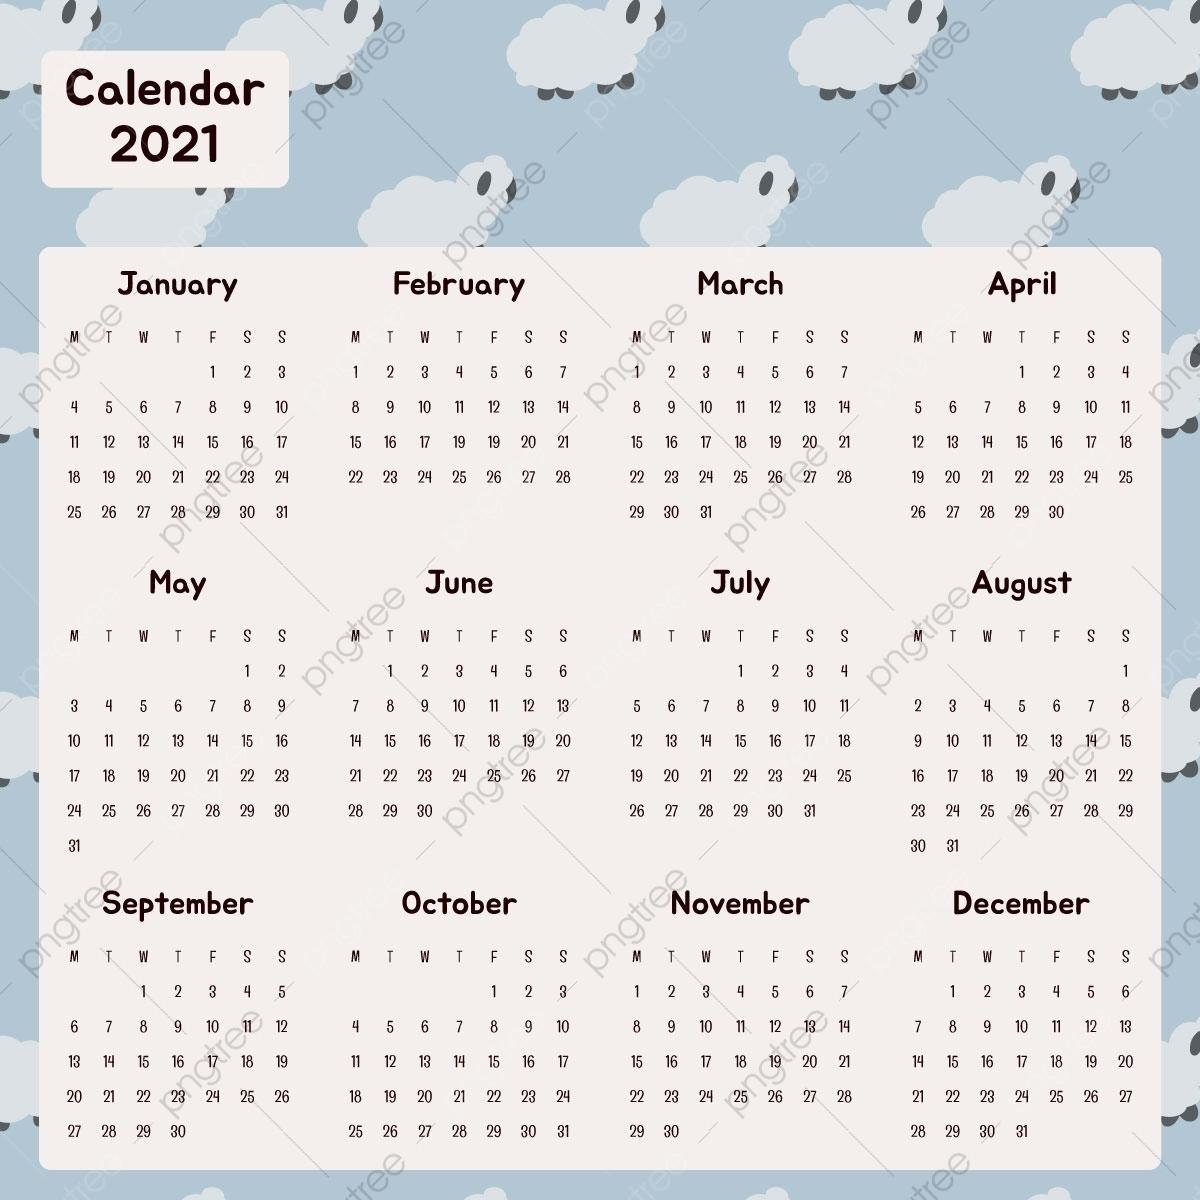 Catch Calendar 2021 For Fill Up